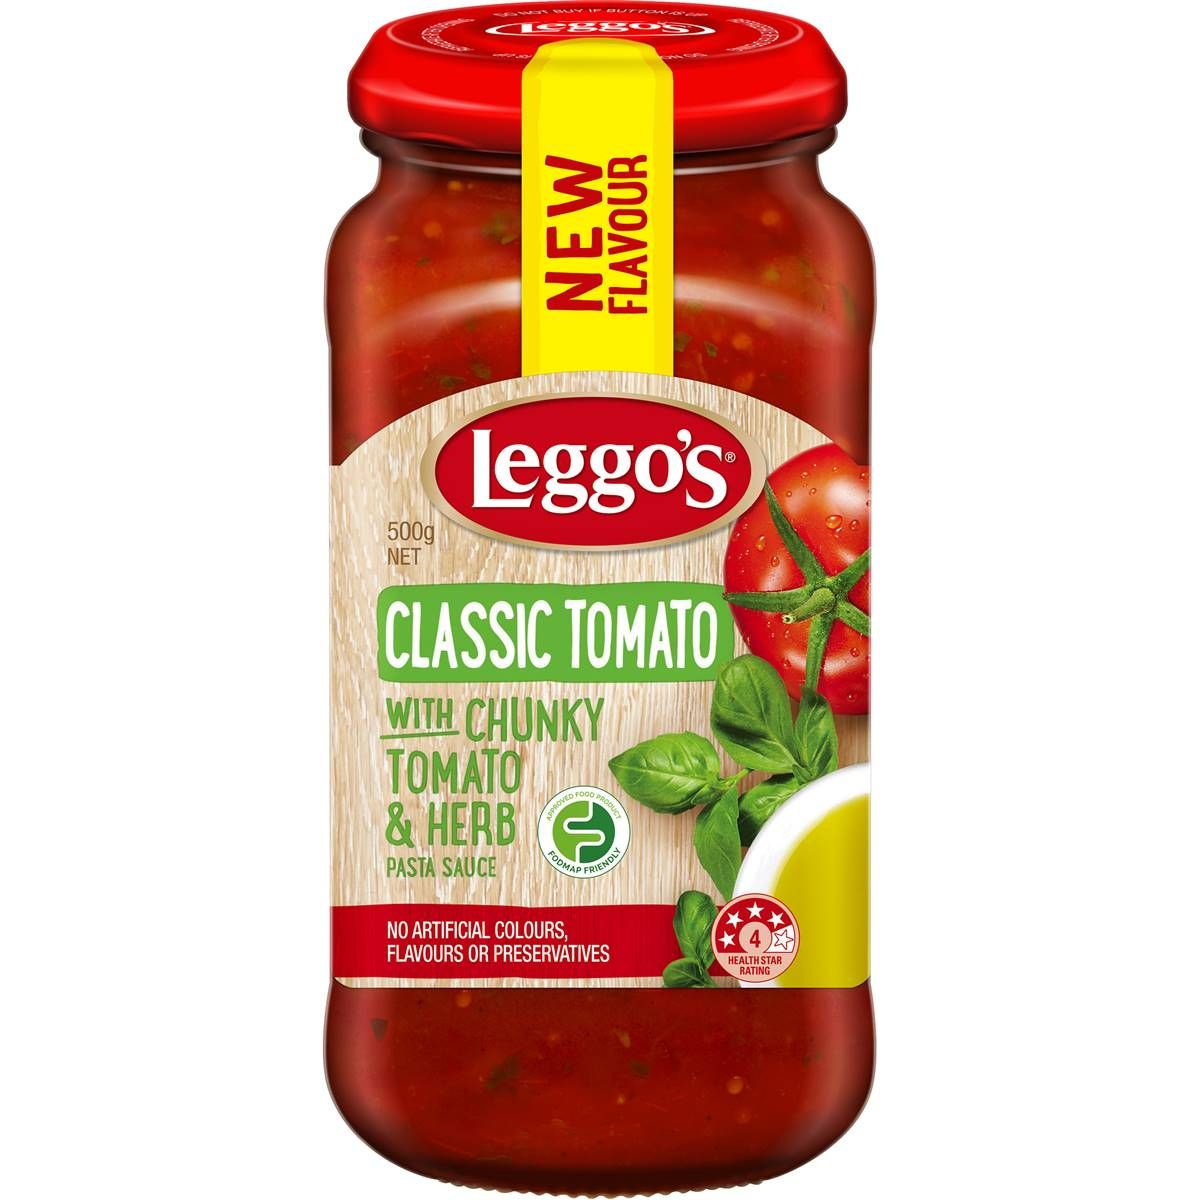 Leggos Classic Tomato Pasta Sauce With Chunky Tomato Herb 500g Woolworths Pasta Sauce Pasta Recipes Pasta Sauce Recipes